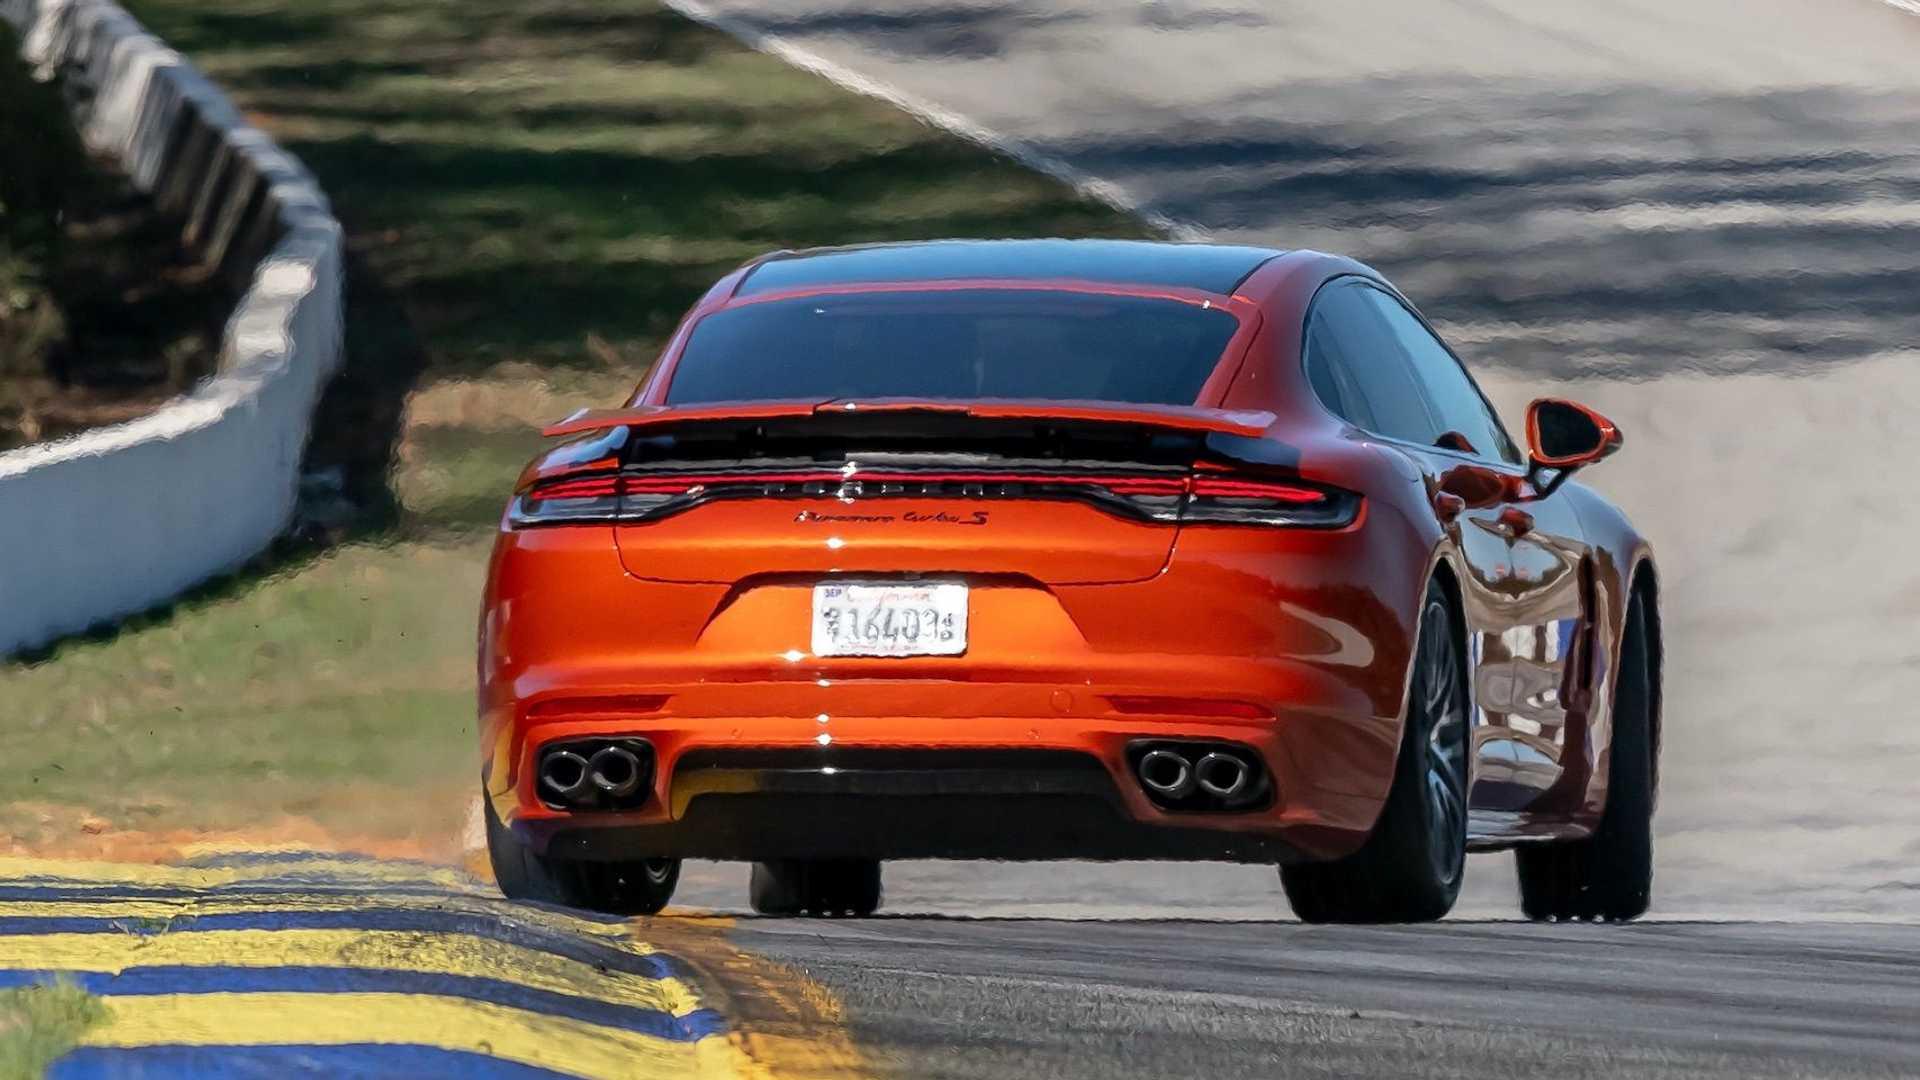 Porsche-Panamera-Turbo-Record-Road-Atlanta-9